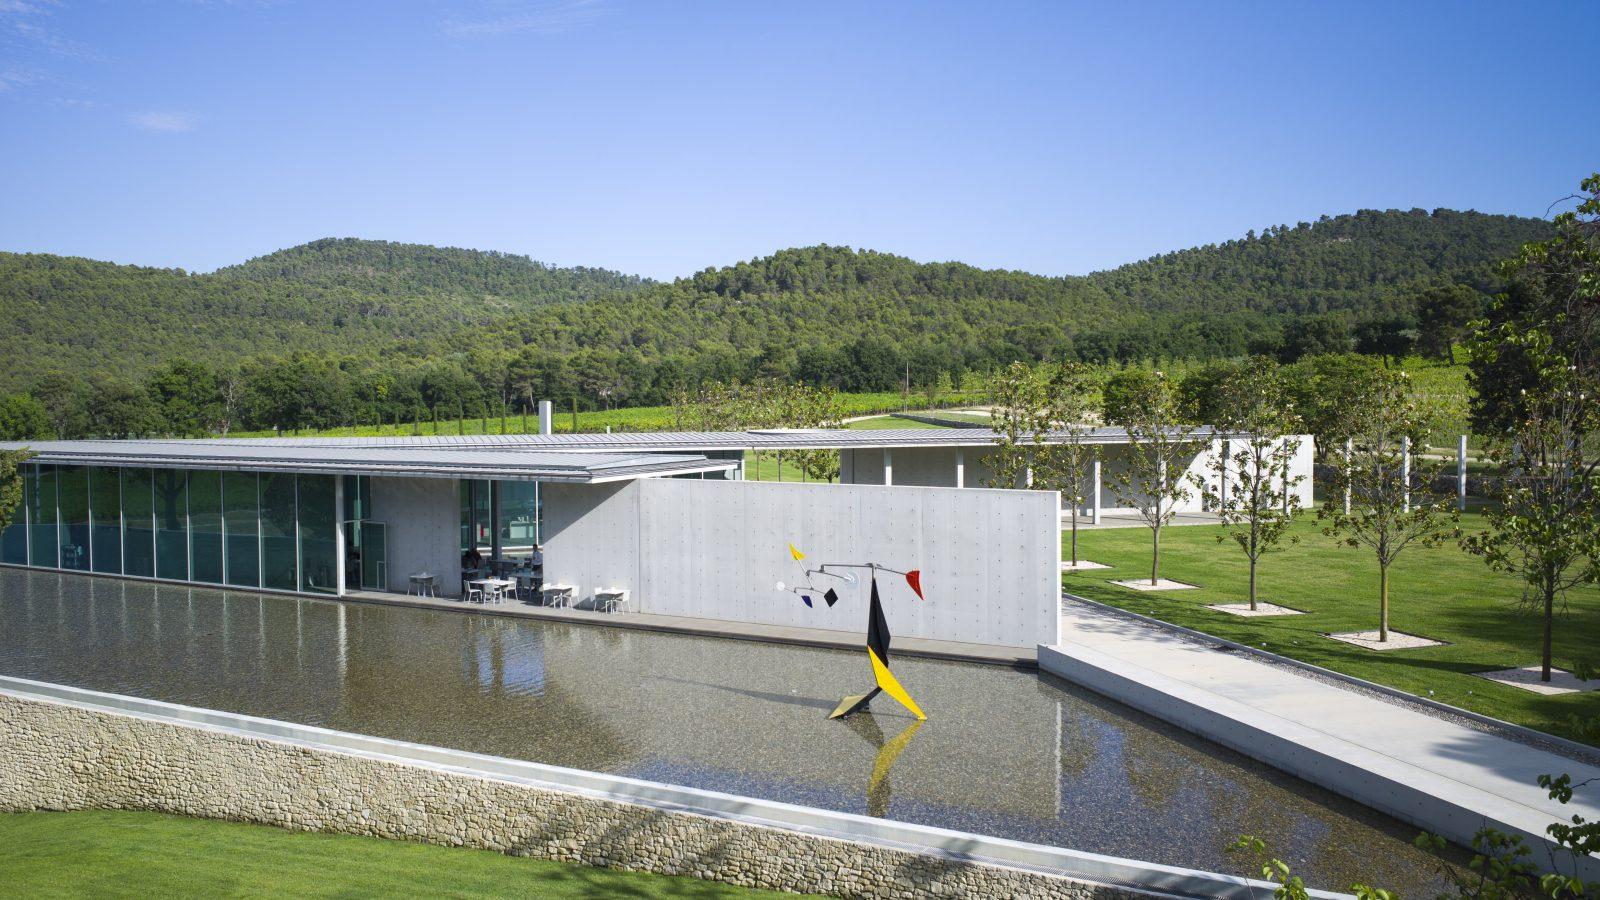 Tadao Ando, Art Centre, 2011 © Tadao Ando, Chateau La Coste, 2016. Photograph (c) Andrew Pattman, 2016